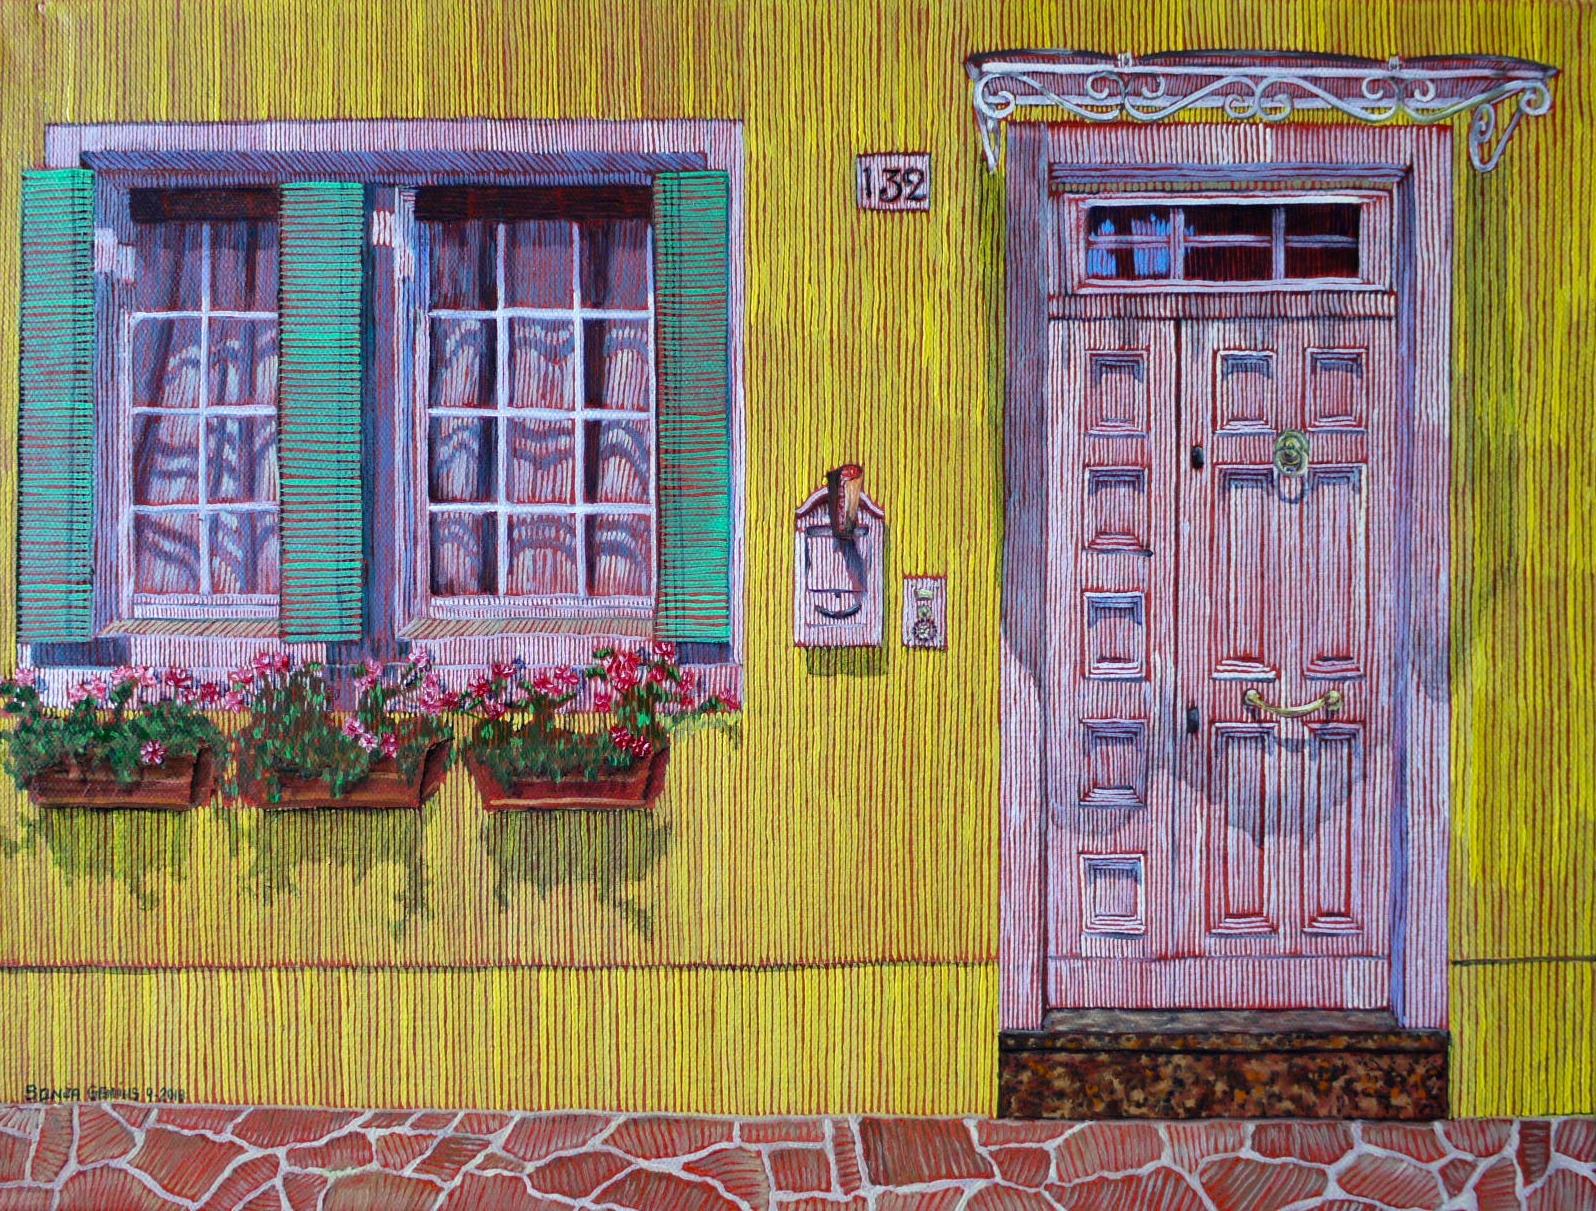 #479 - Doors of Europe Series VI, oil on canvas 12x16, 9/18